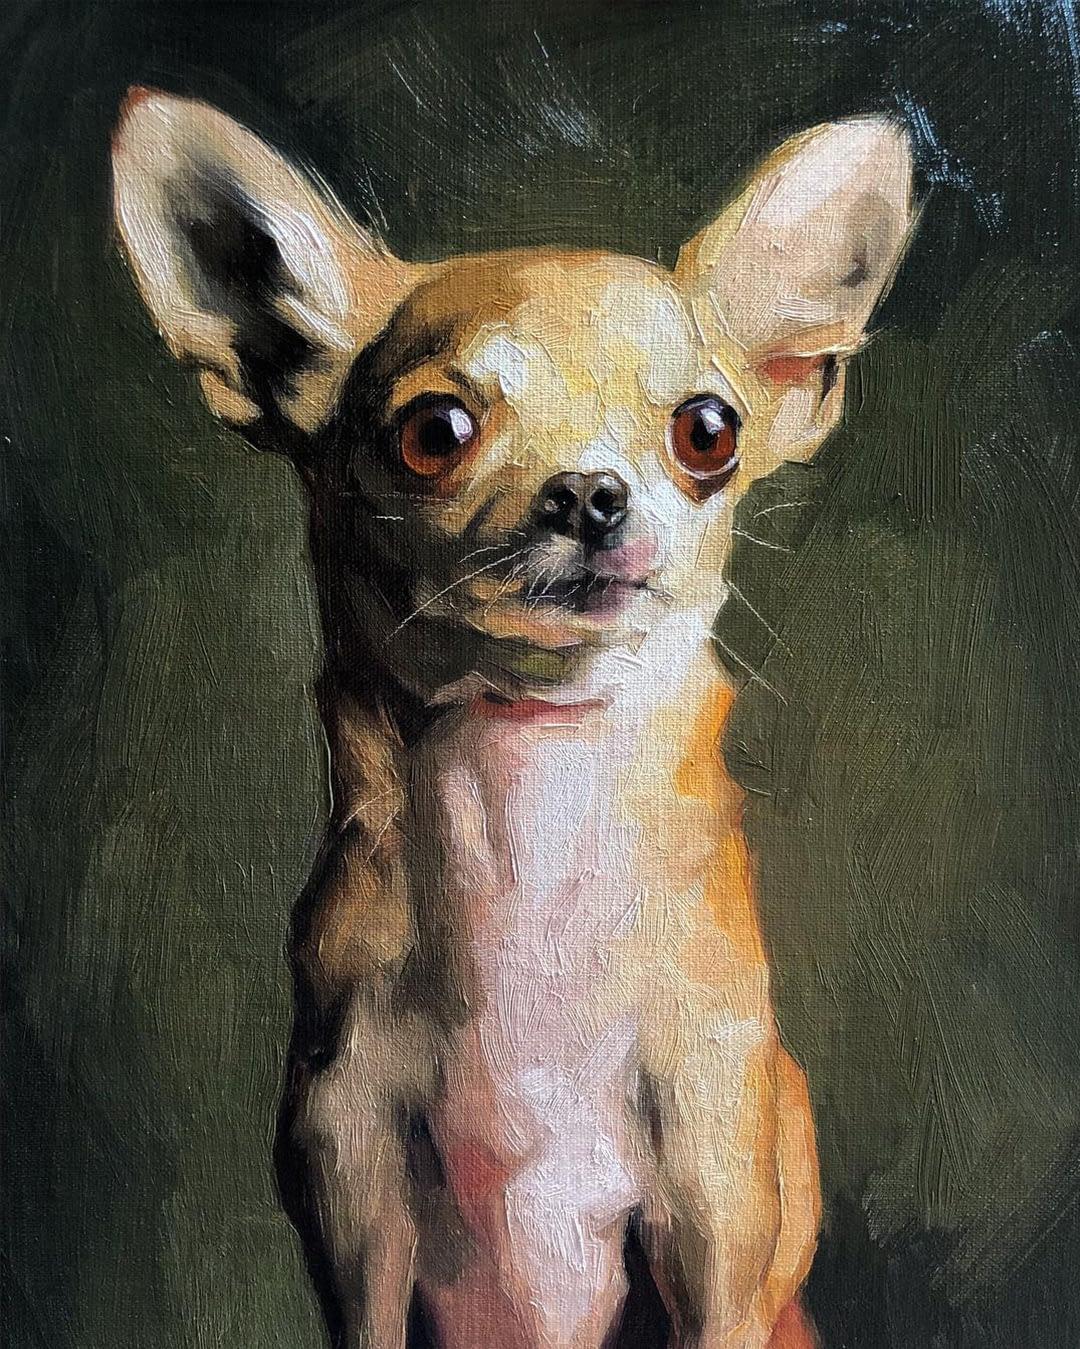 Chihuahua oil painting by artist Jennifer Gennari